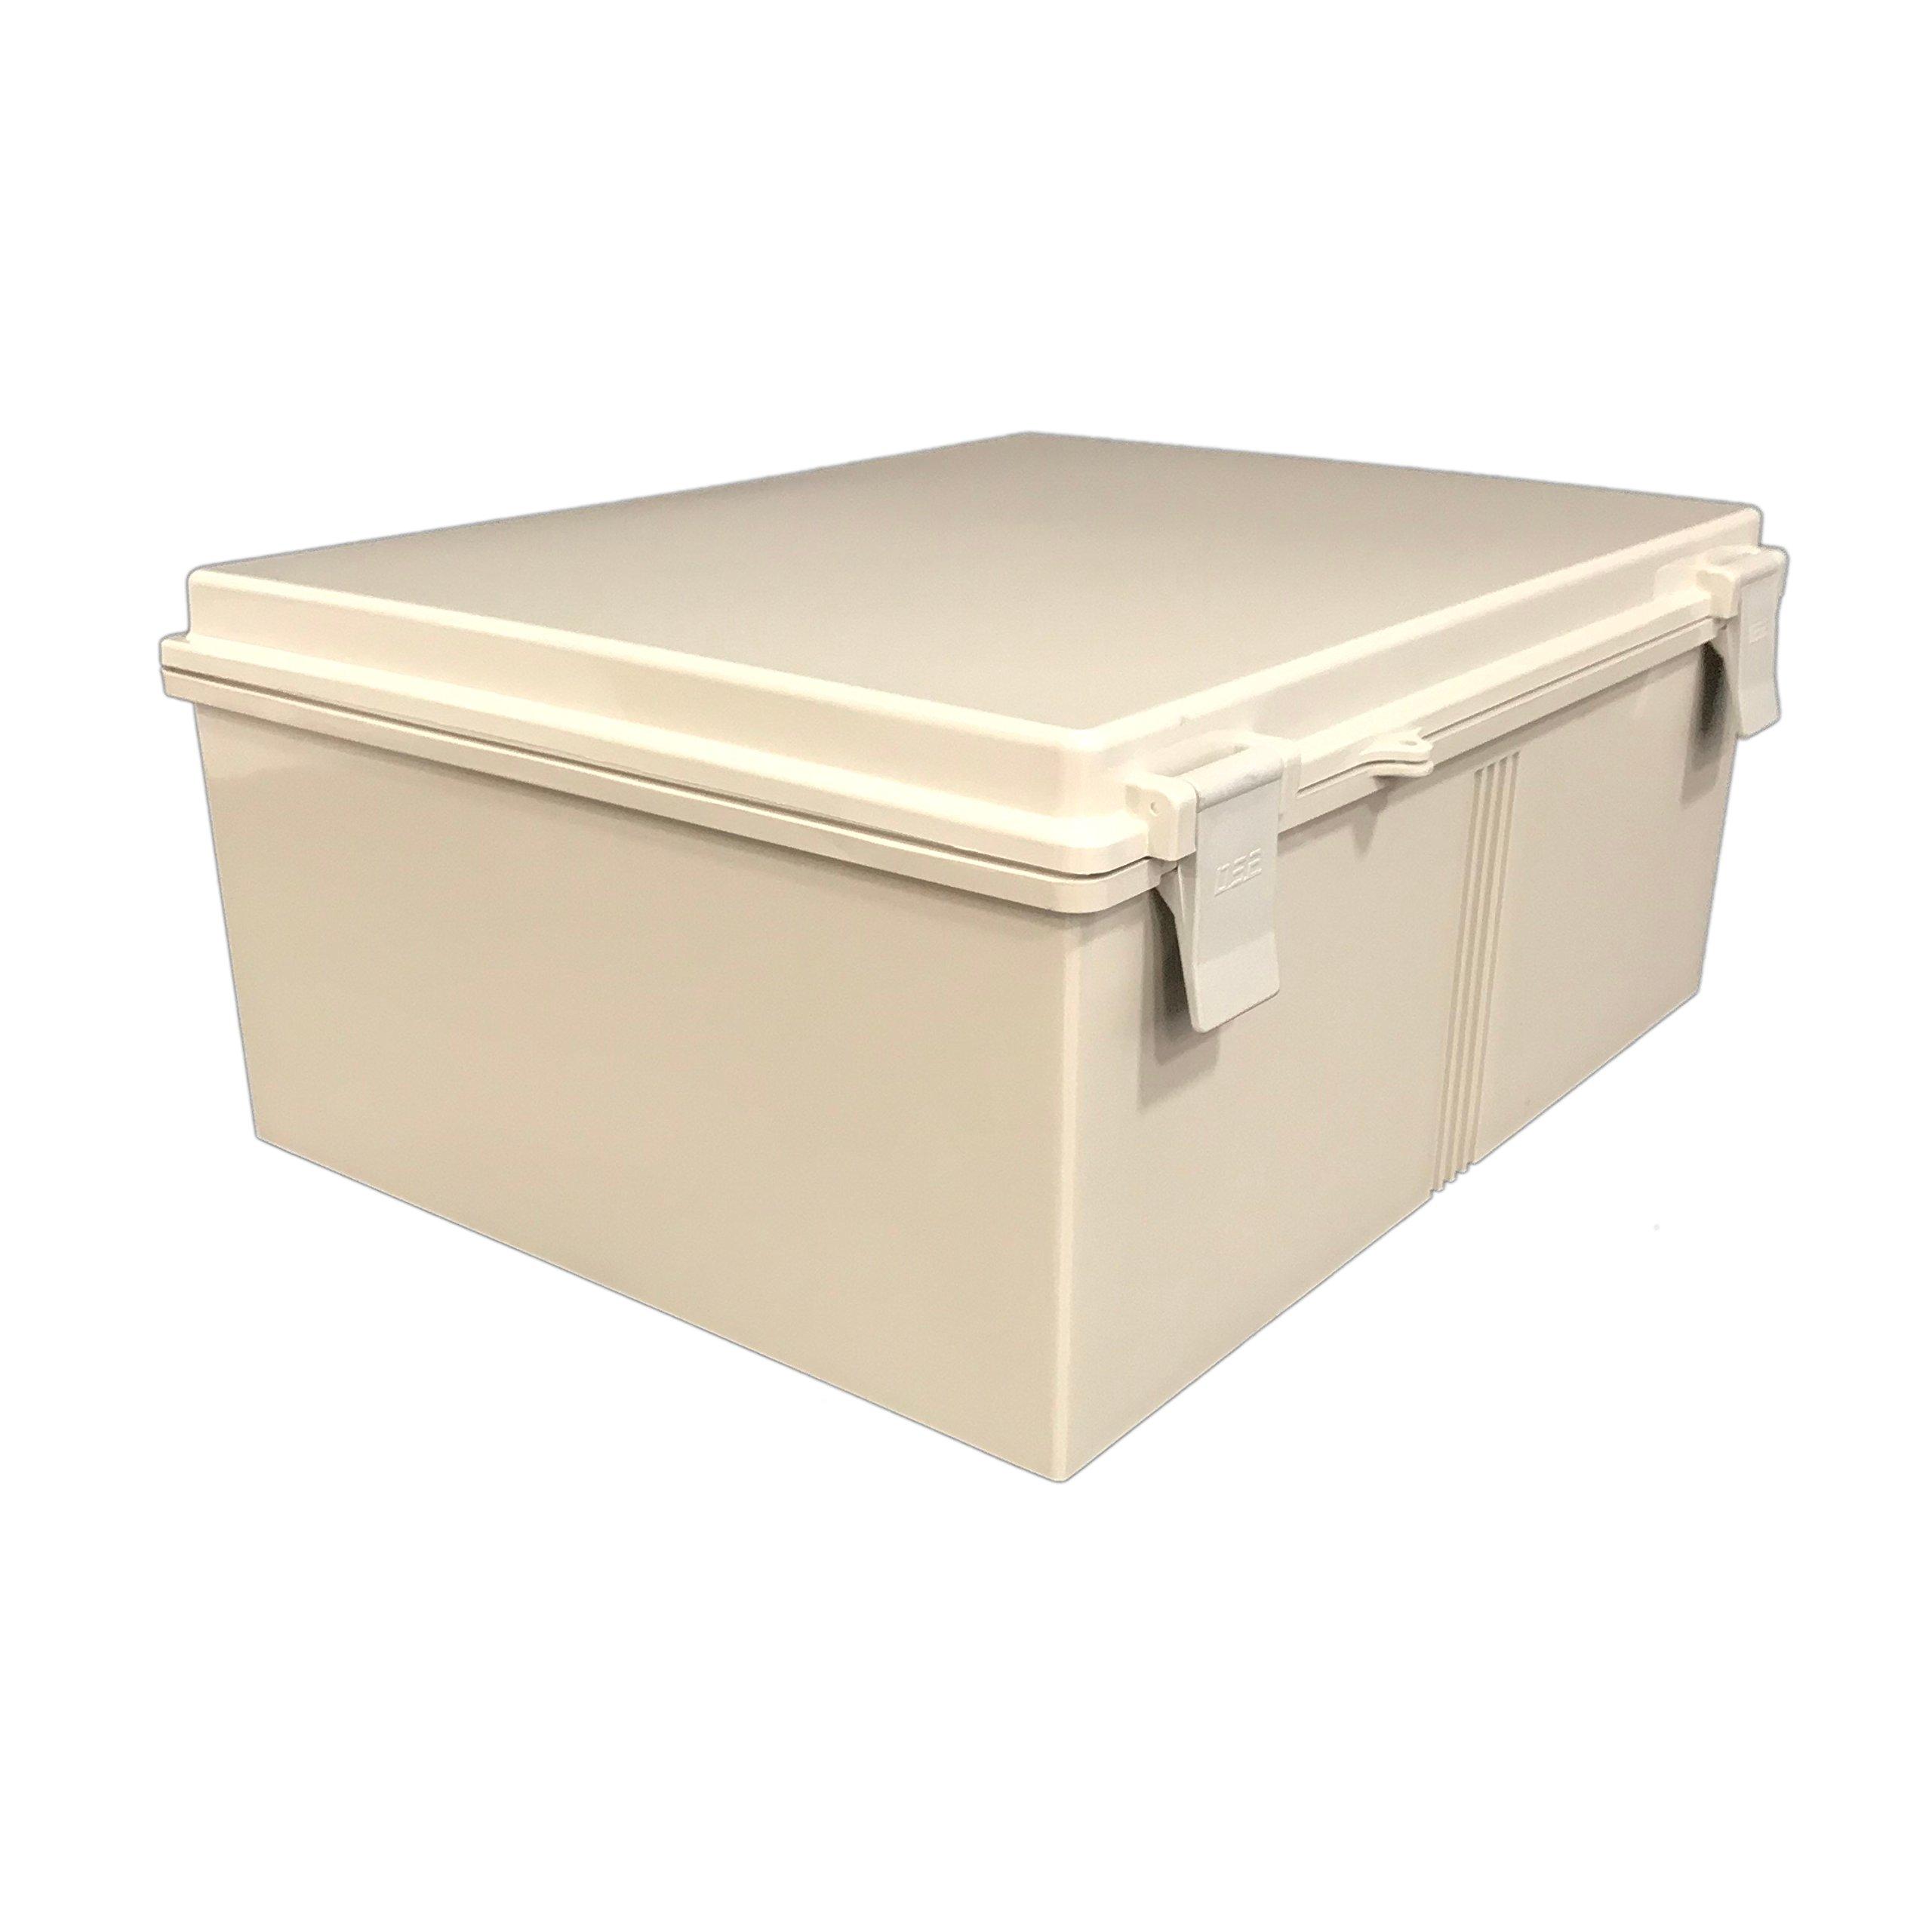 BUD Industries NBB-22253 Style B Plastic NEMA Box with Solid Indoor, 19-63/64'' Length x 14-5/8'' Width x 7-27/32'' Height, Light Gray Finish